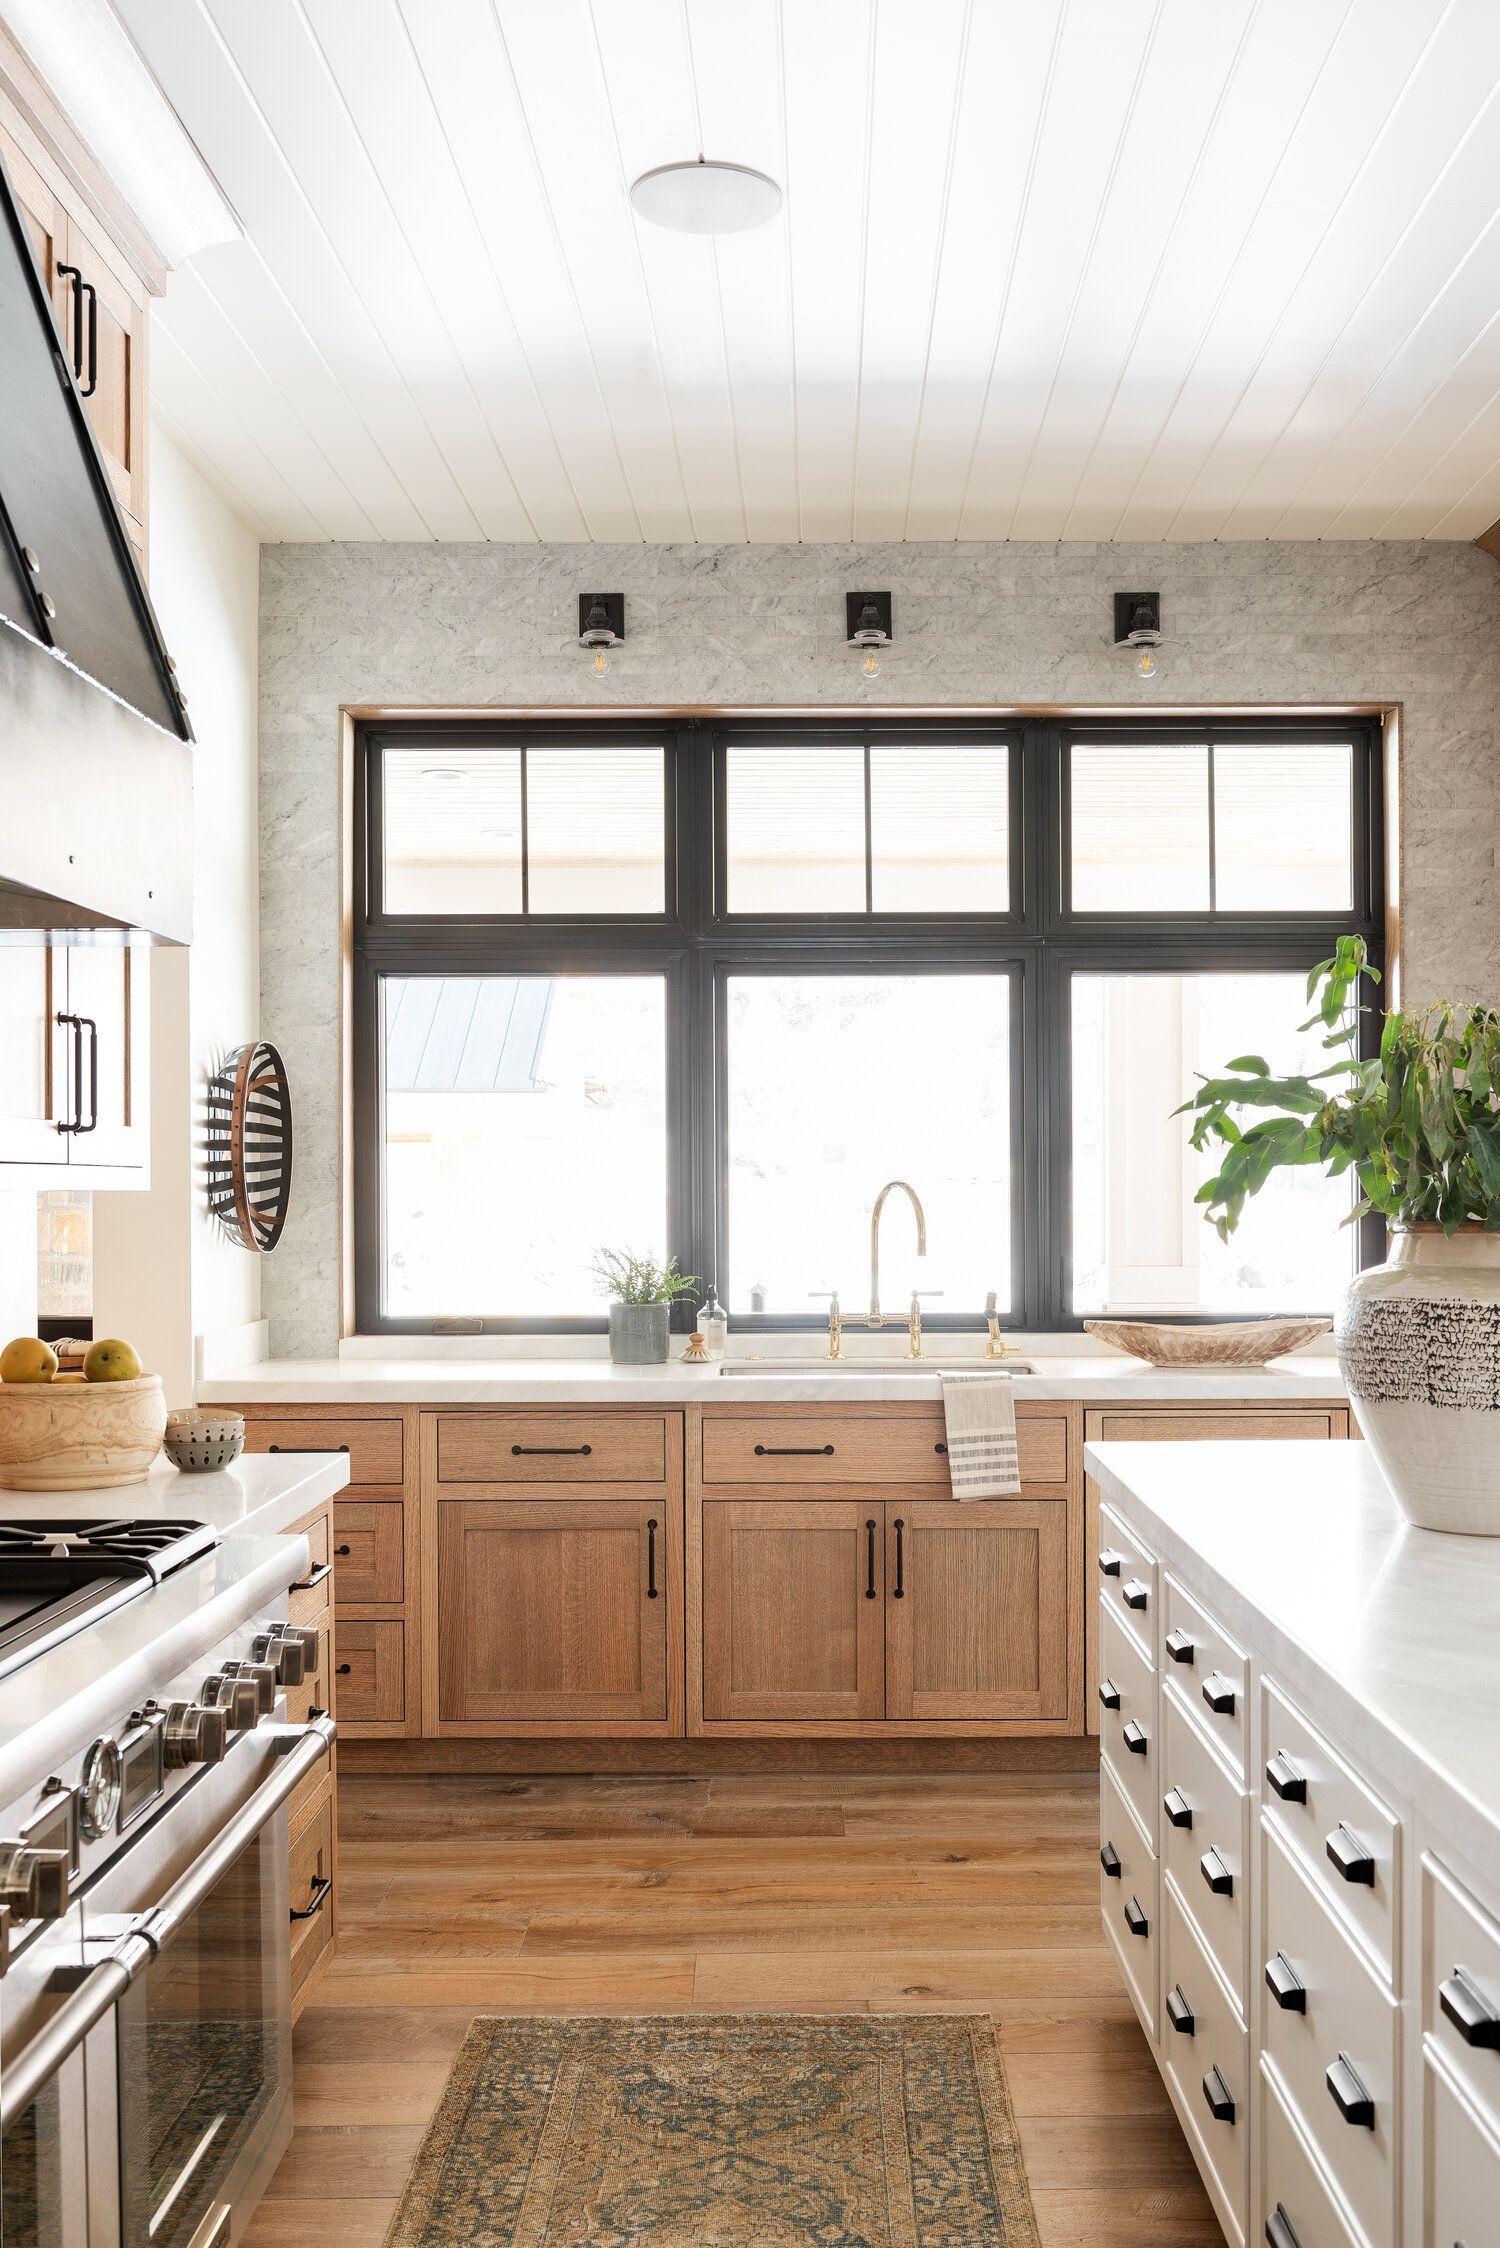 Natural Wood Kitchen Design Studio Mcgee Kitchens In 2020 Latest Kitchen Designs Kitchen Design Kitchen Interior